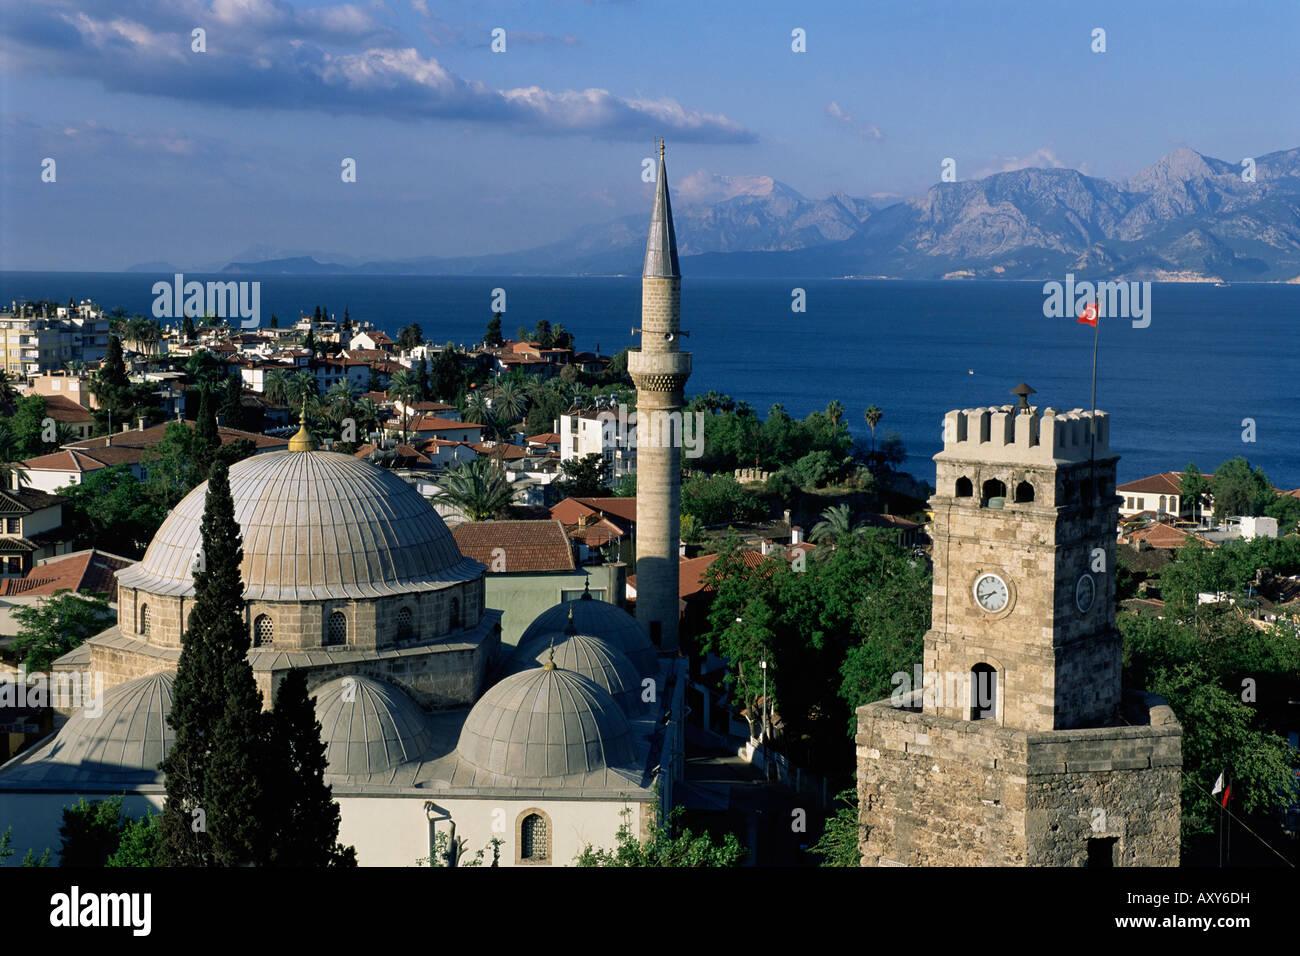 Antalya, Lycia, Anatolia, Turkey, Asia Minor, Asia - Stock Image